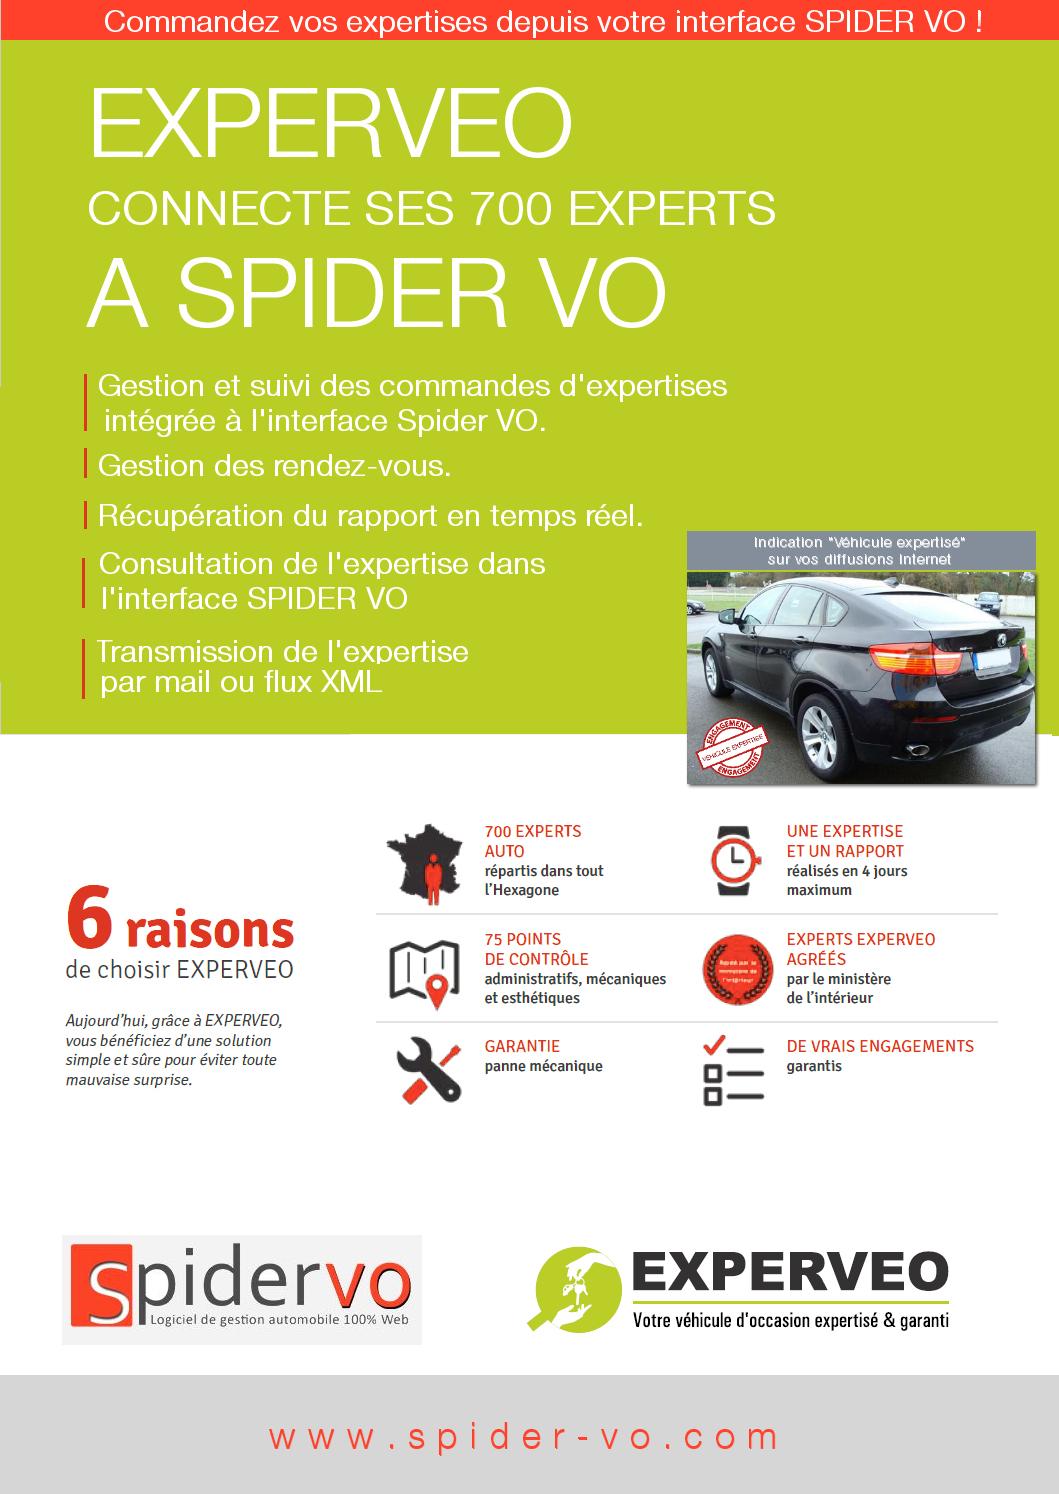 EXPERVEO connecte ses 700 experts à SPIDER VO ! 2